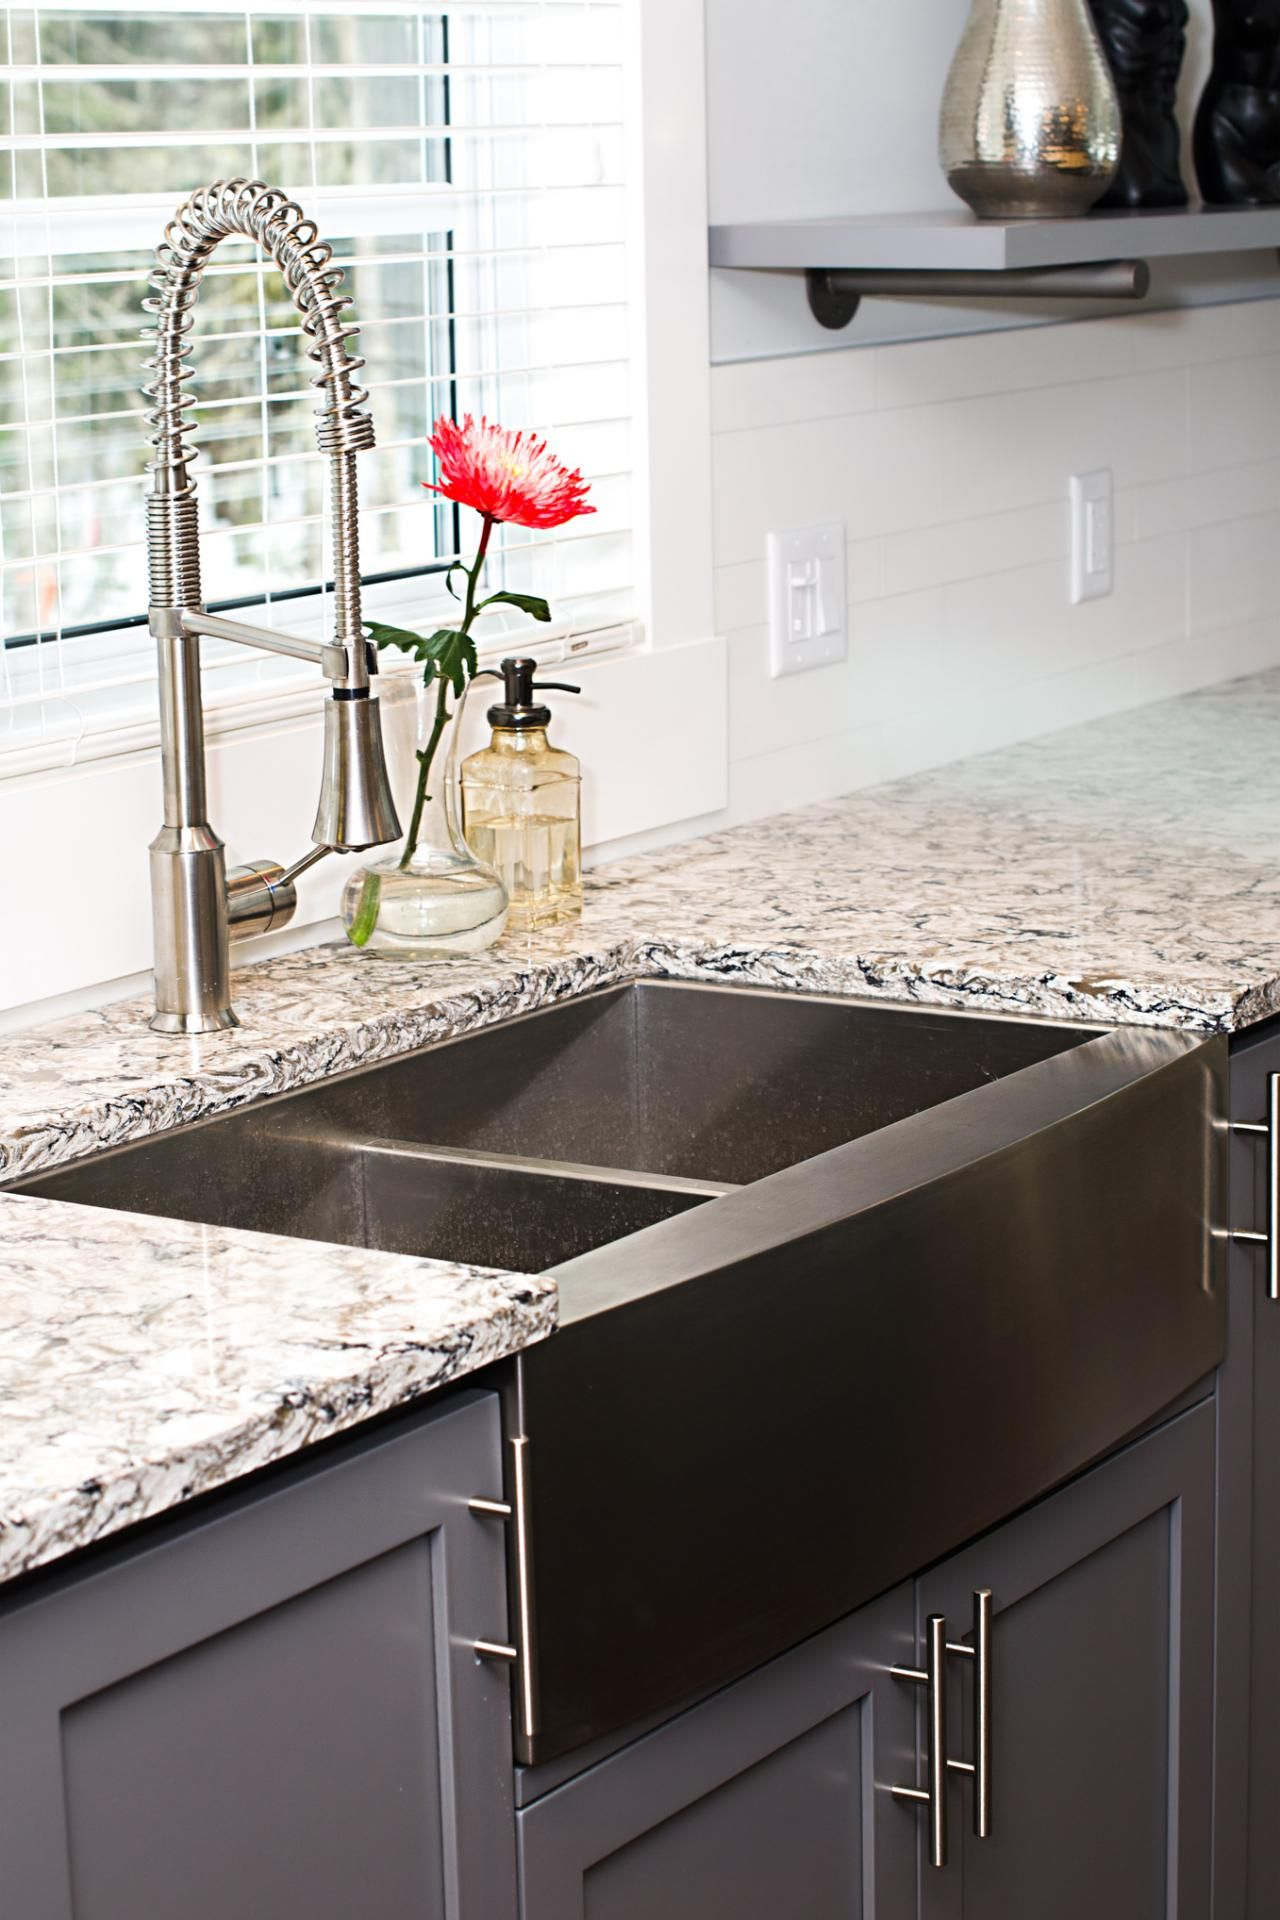 Black Stainless Steel Kitchen Cart Home Depot Sink Photos Hgtv My Dream